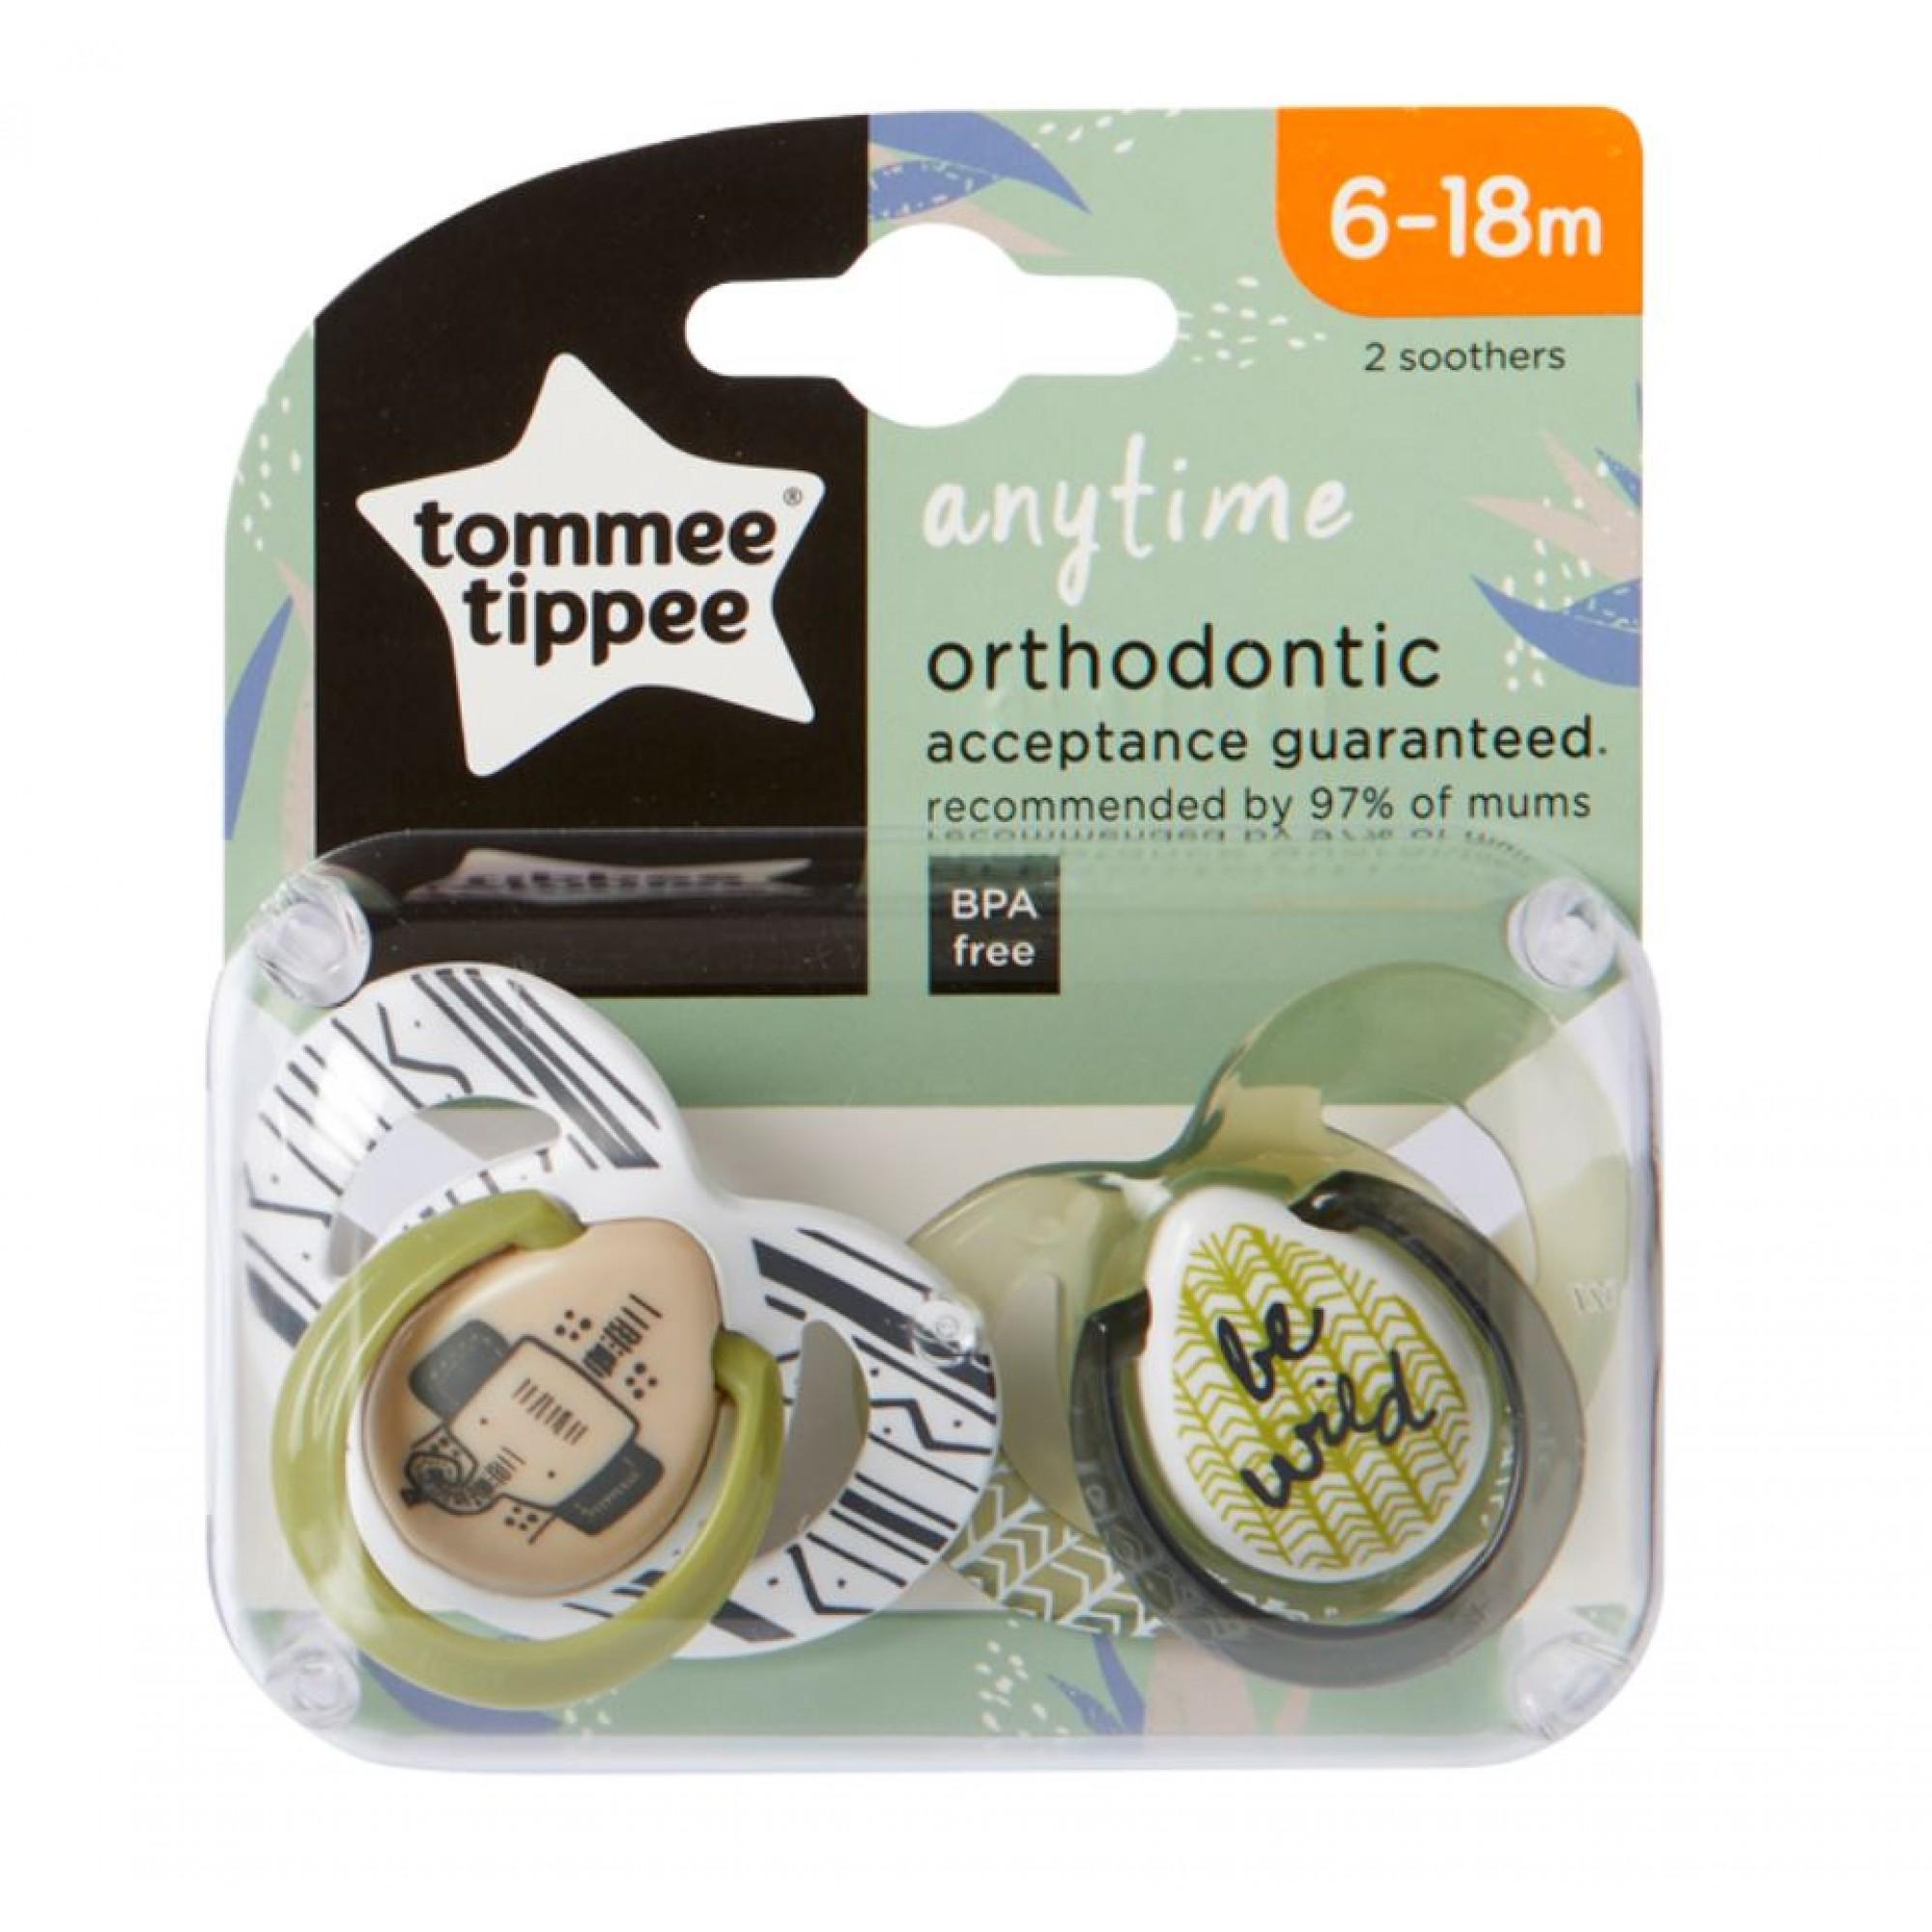 Set Suzete Ortodontice Anytime, Tommee Tippee, 6-18 Luni, 2 buc, Elefantel